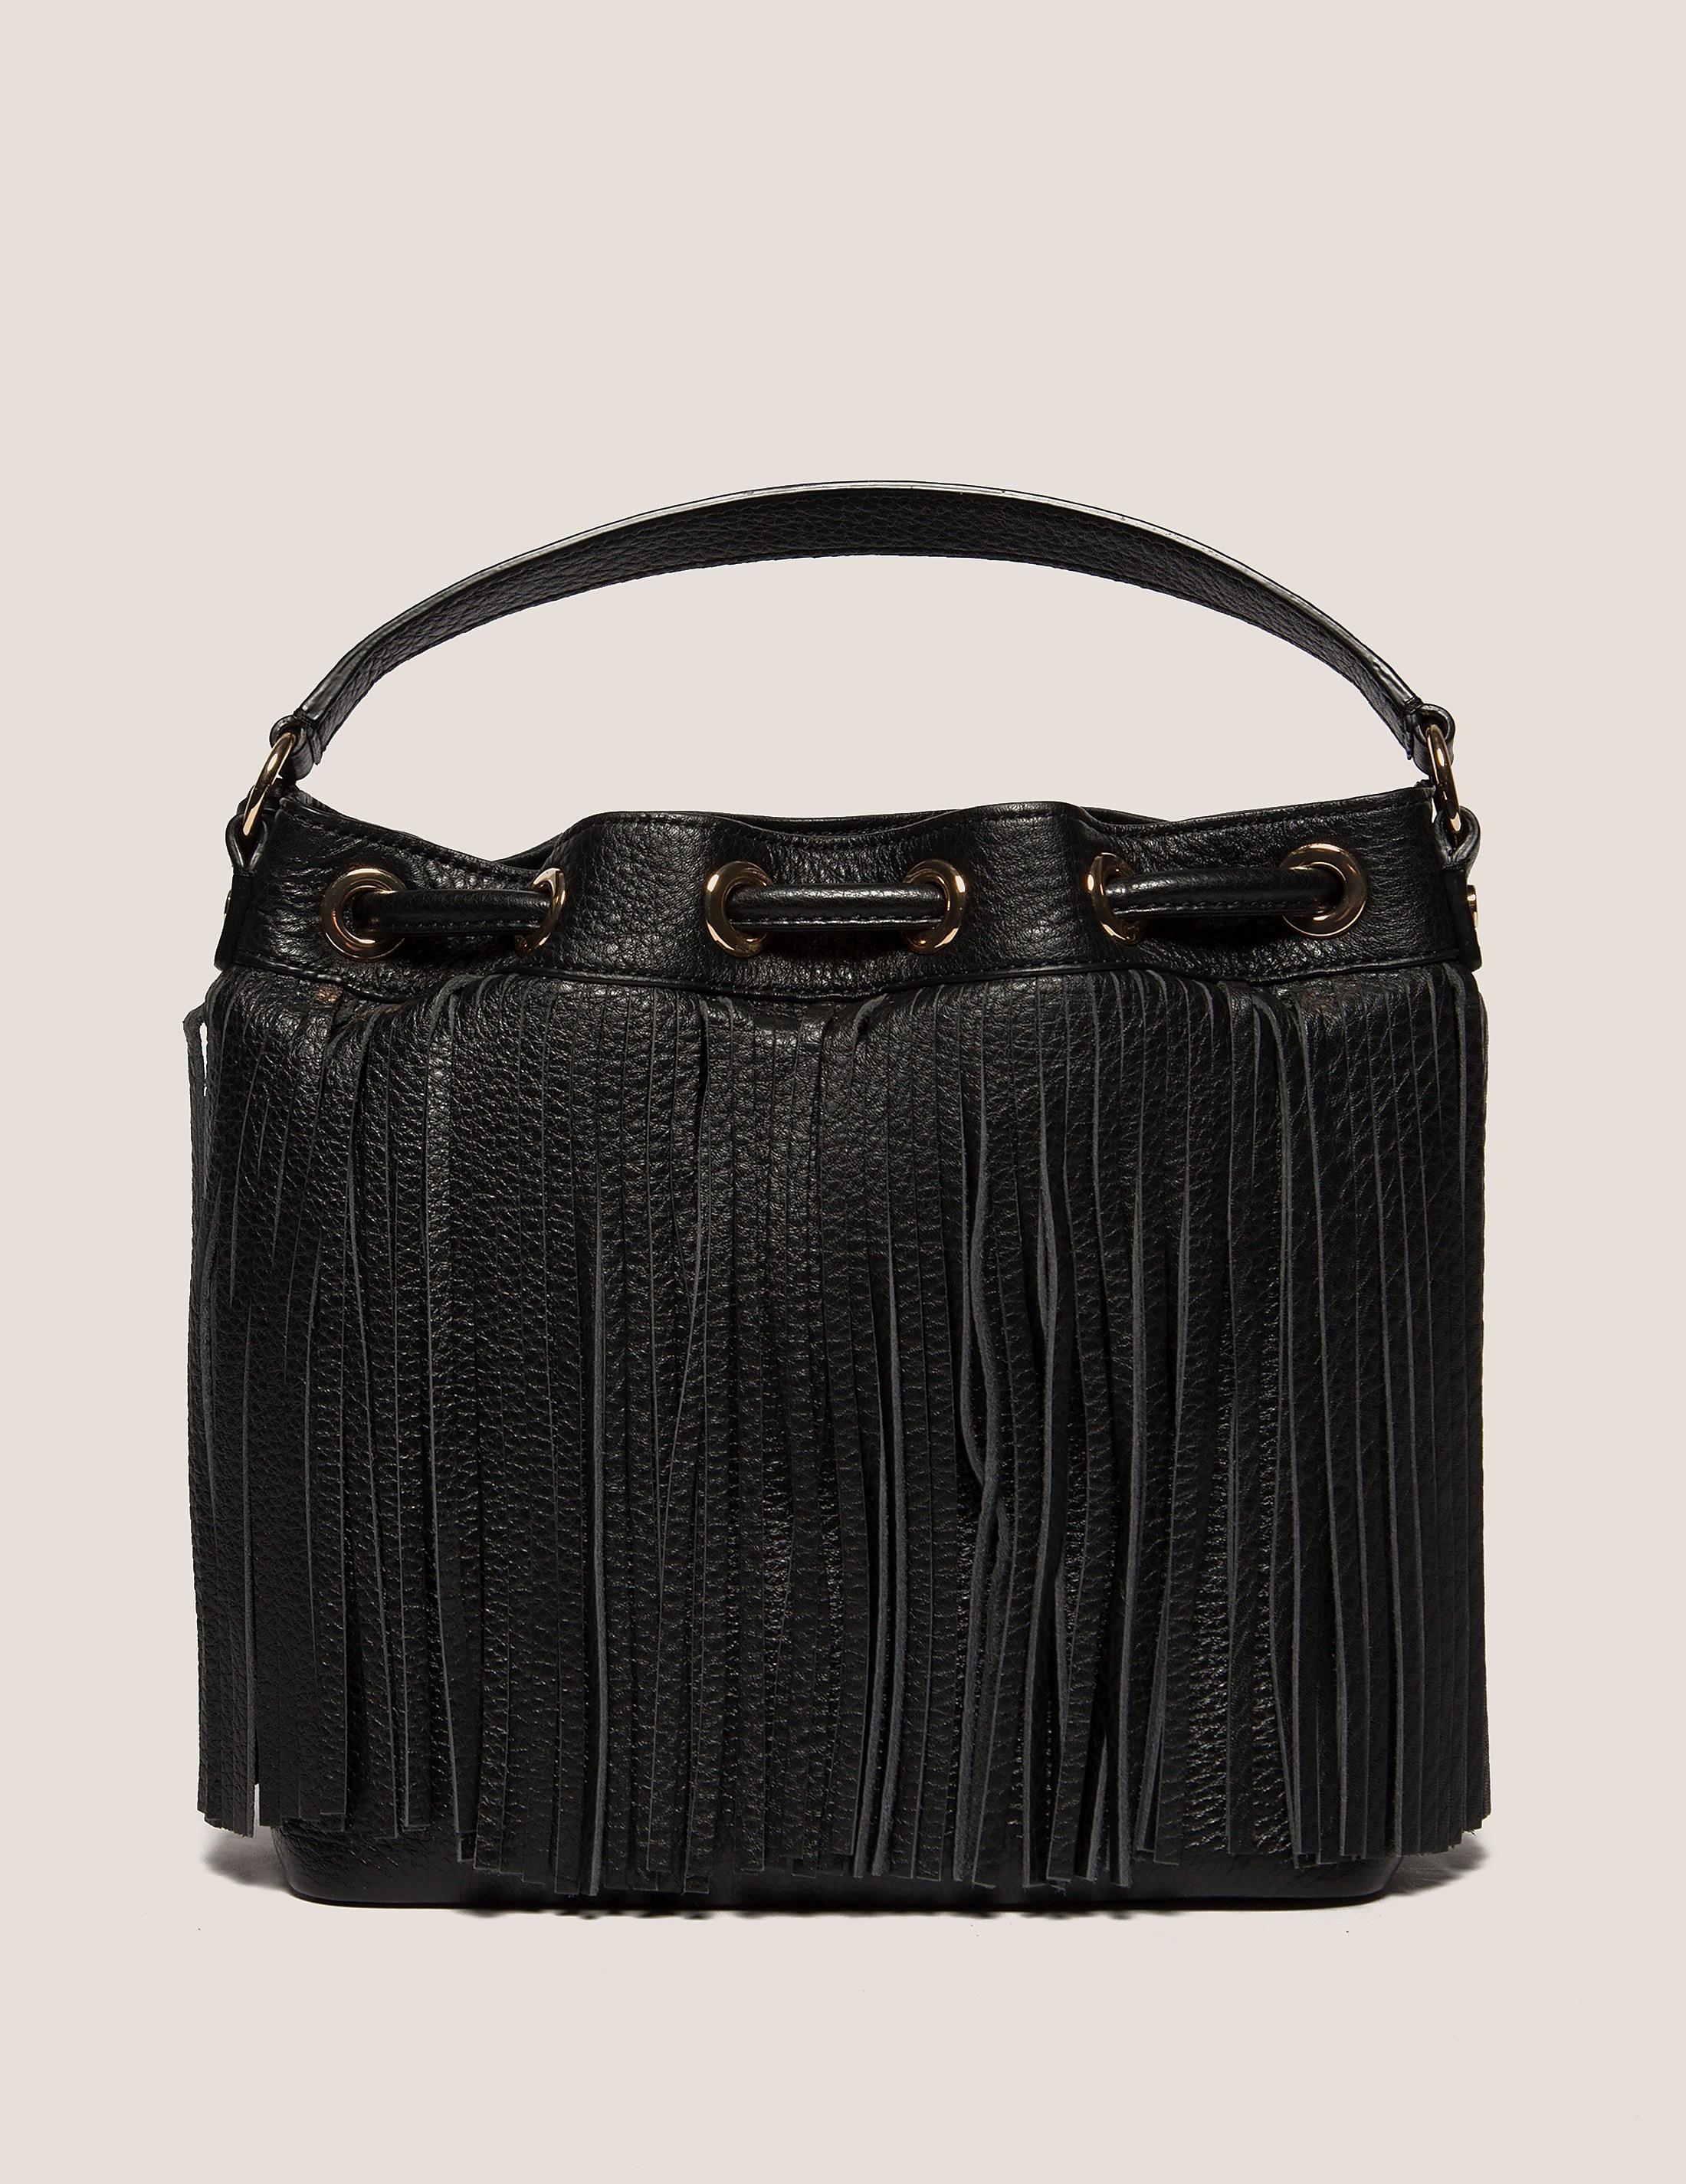 Juicy Couture Topanga Fringe Leather Drawstring Bag